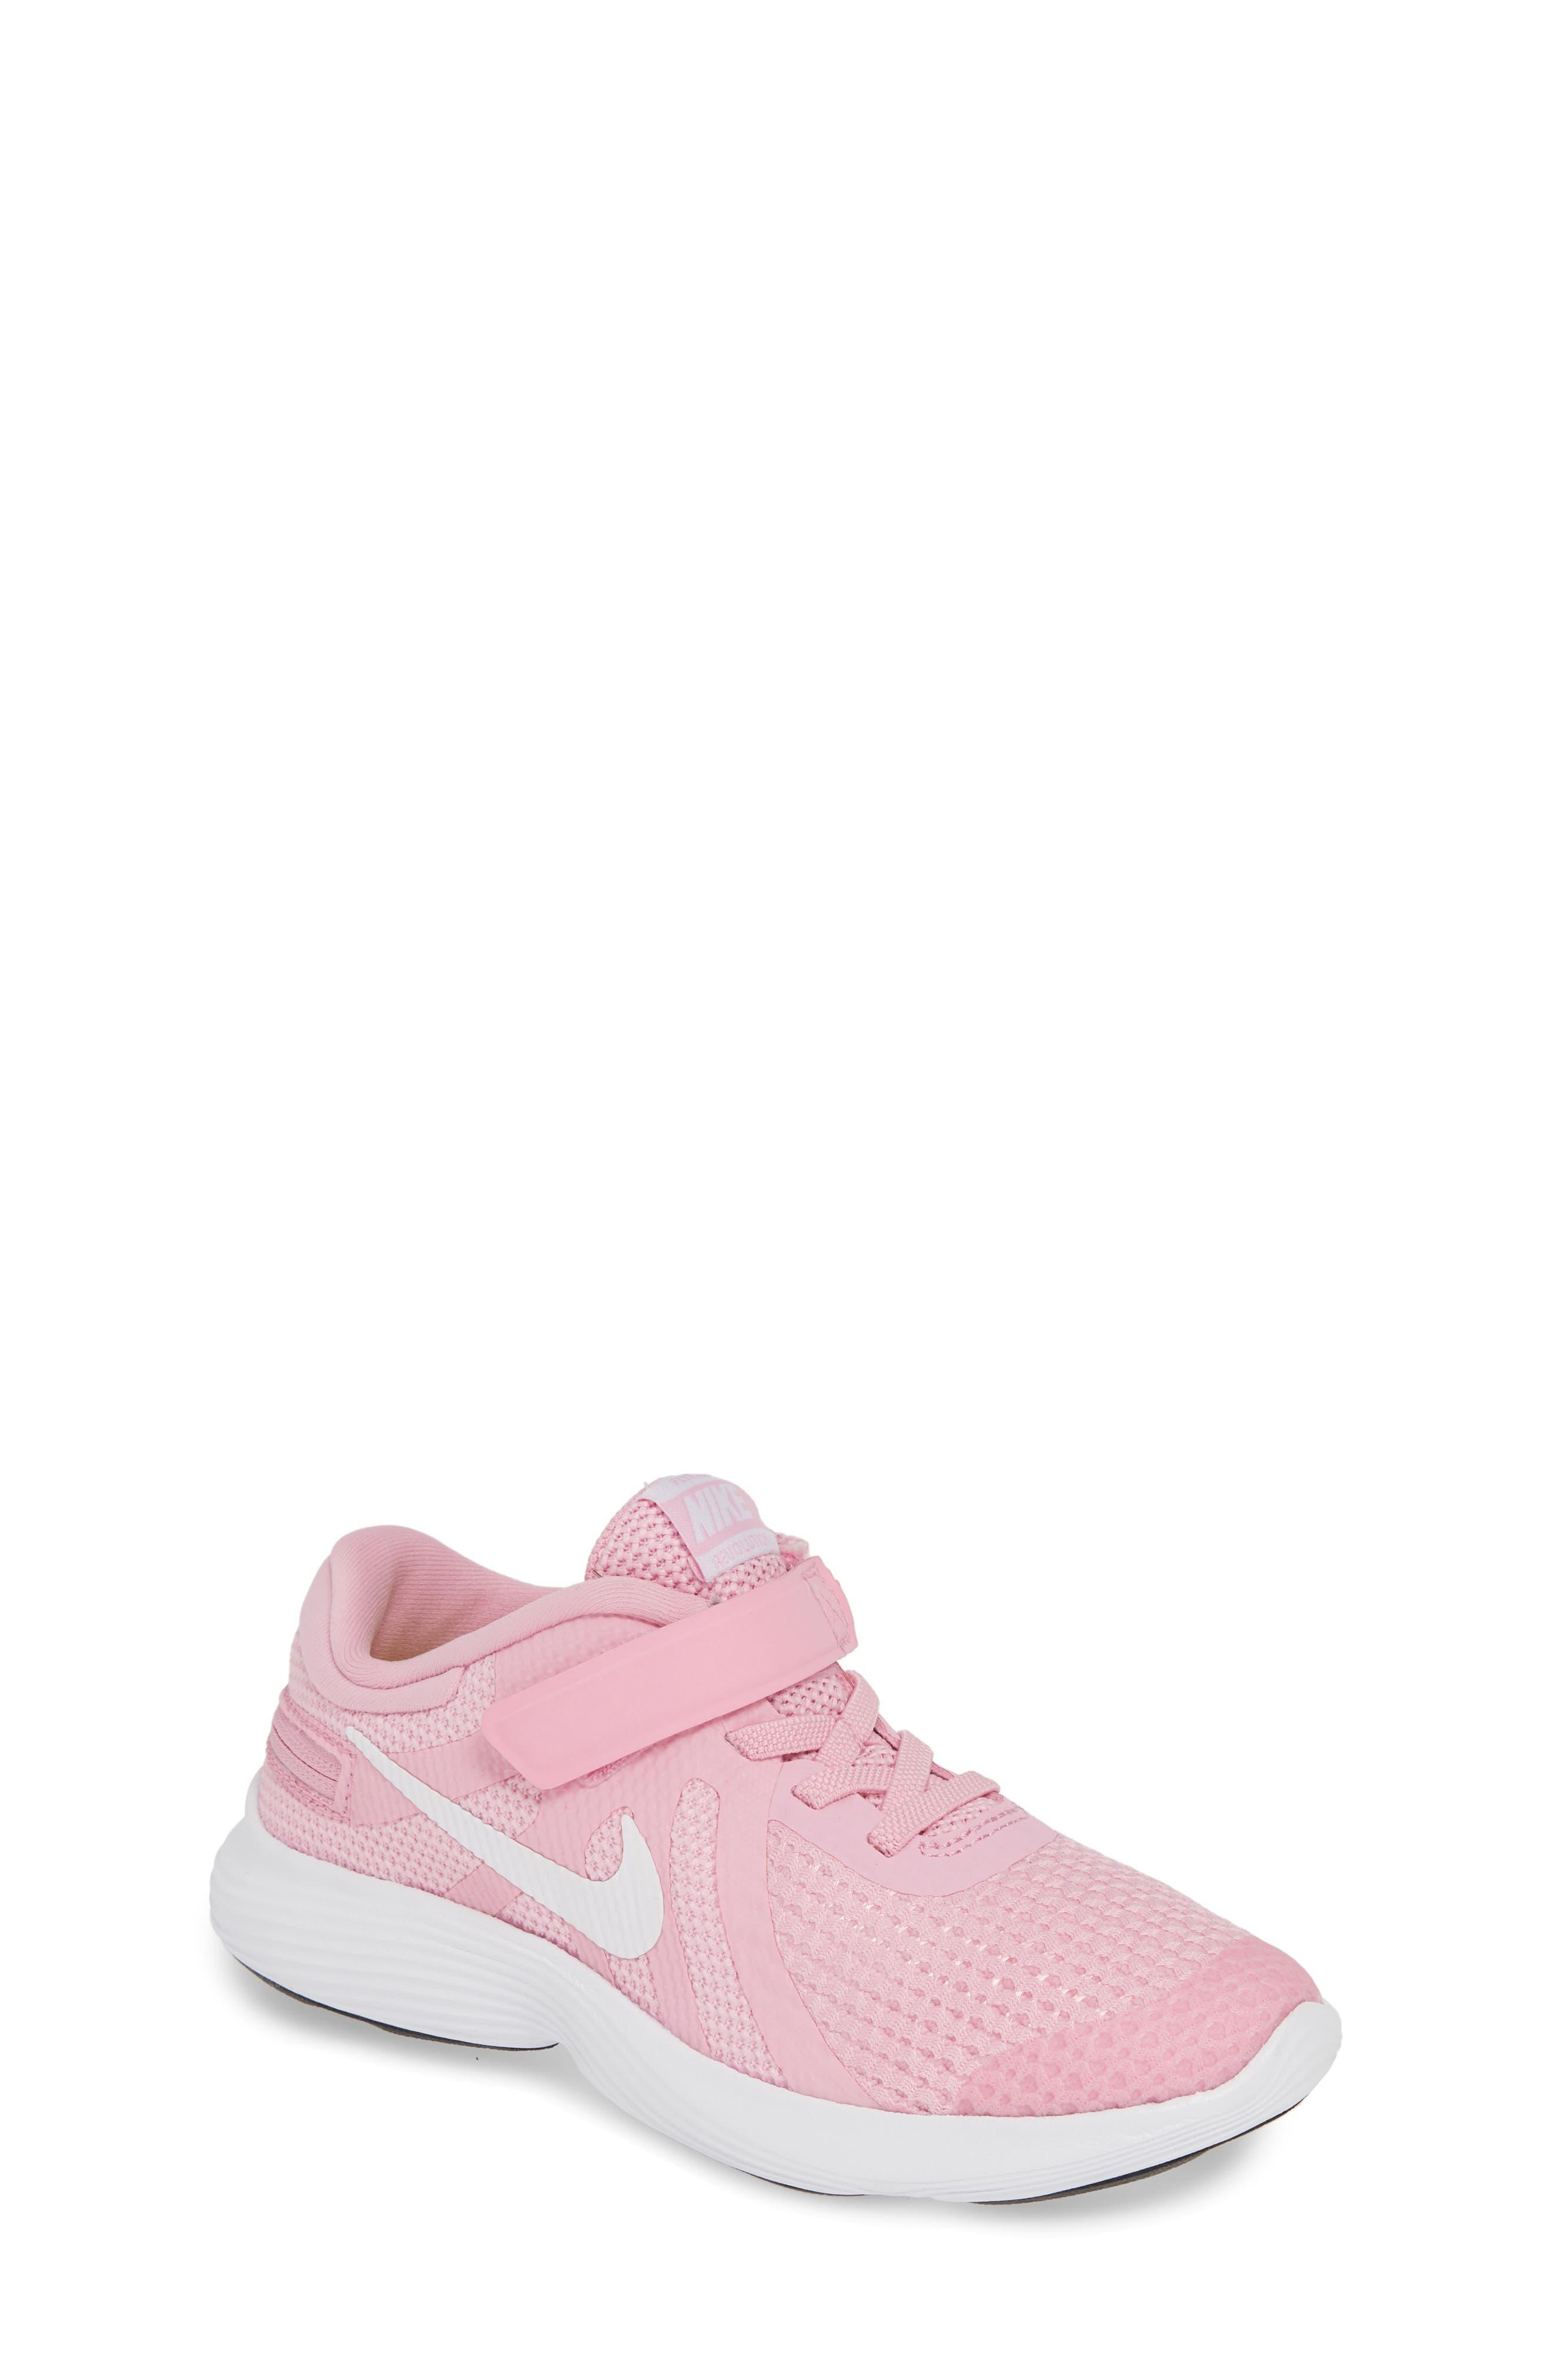 Toddler Nike Revolution 4 Flyease Sneaker Size 13 M  Pink